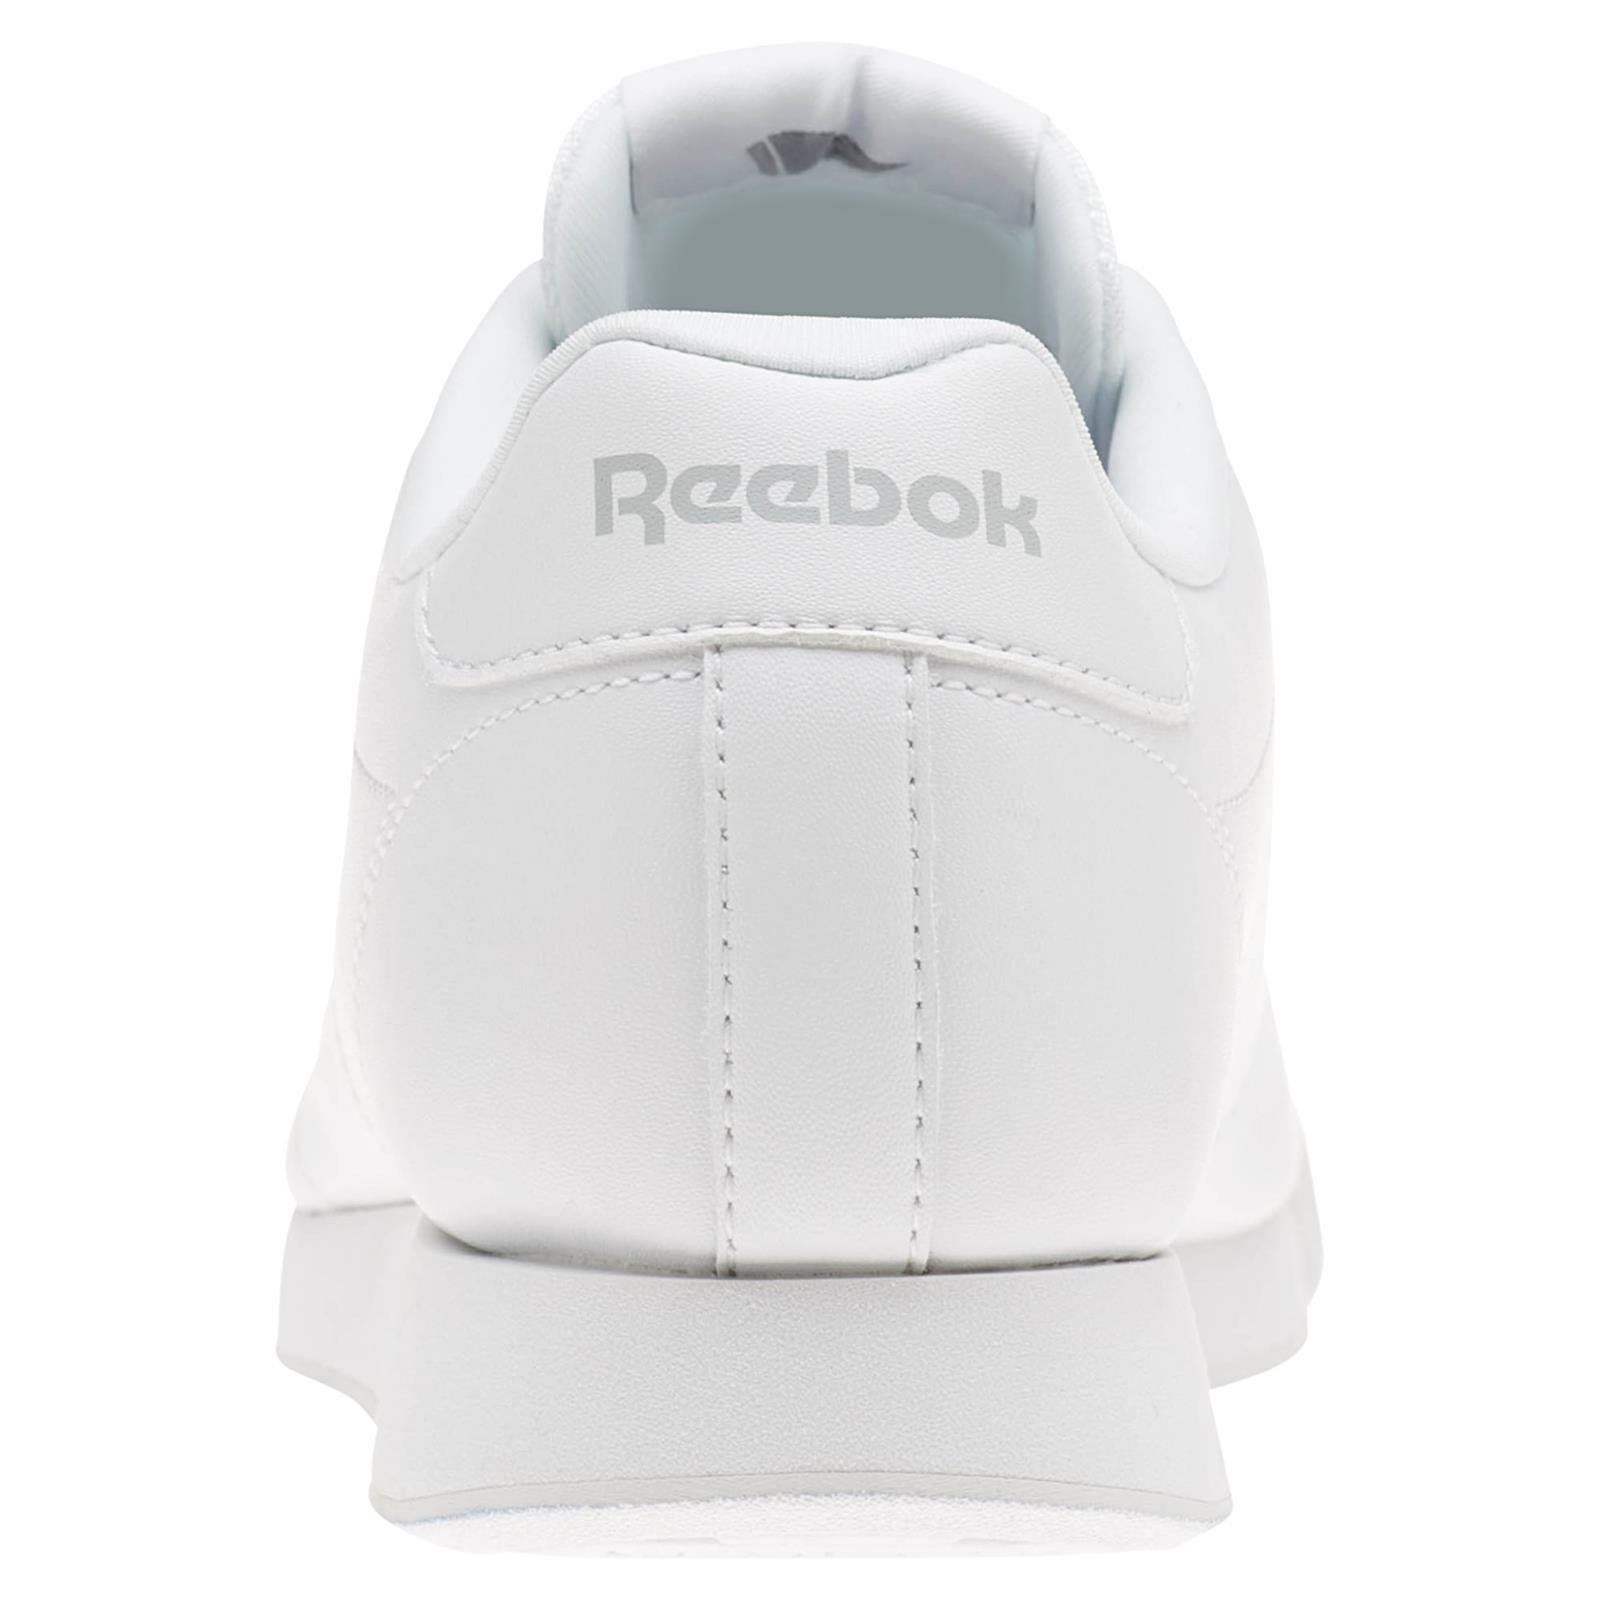 Buty Reebok Royal Charm CN0963